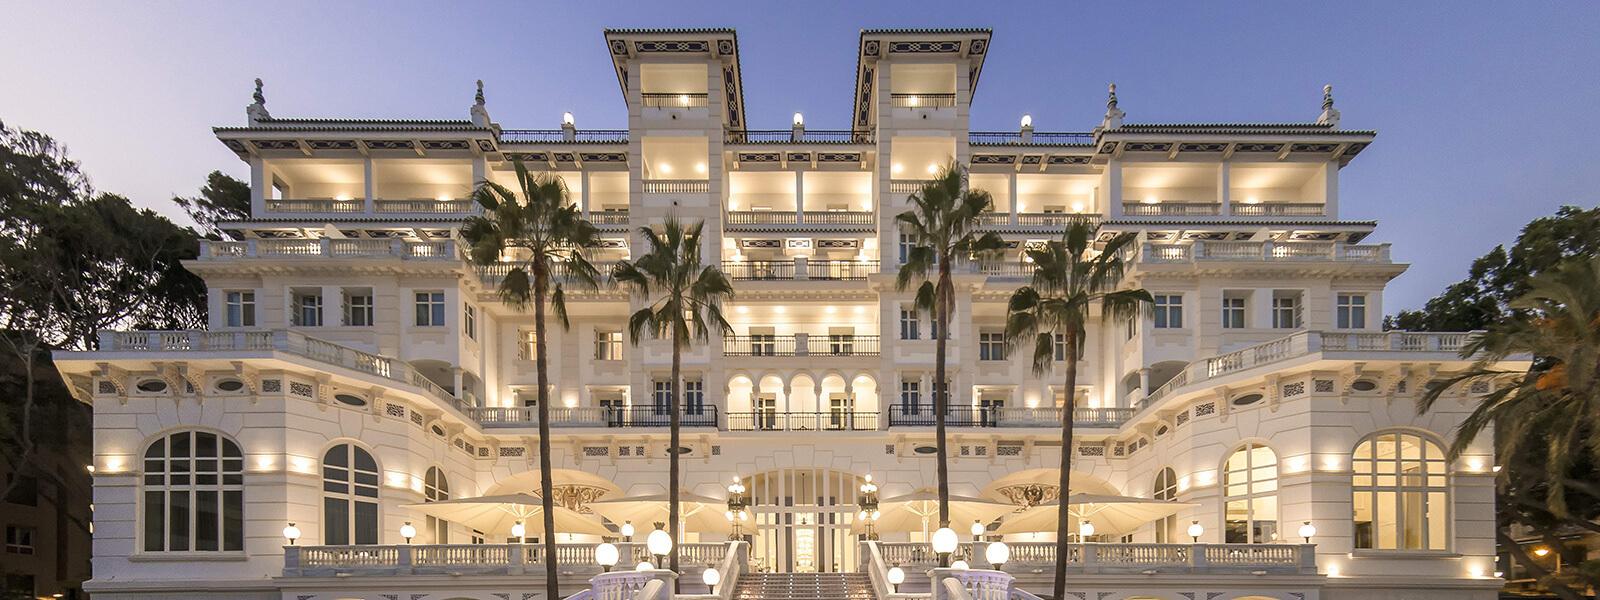 Fachada del histórico Gran Hotel Miramar (Málaga).